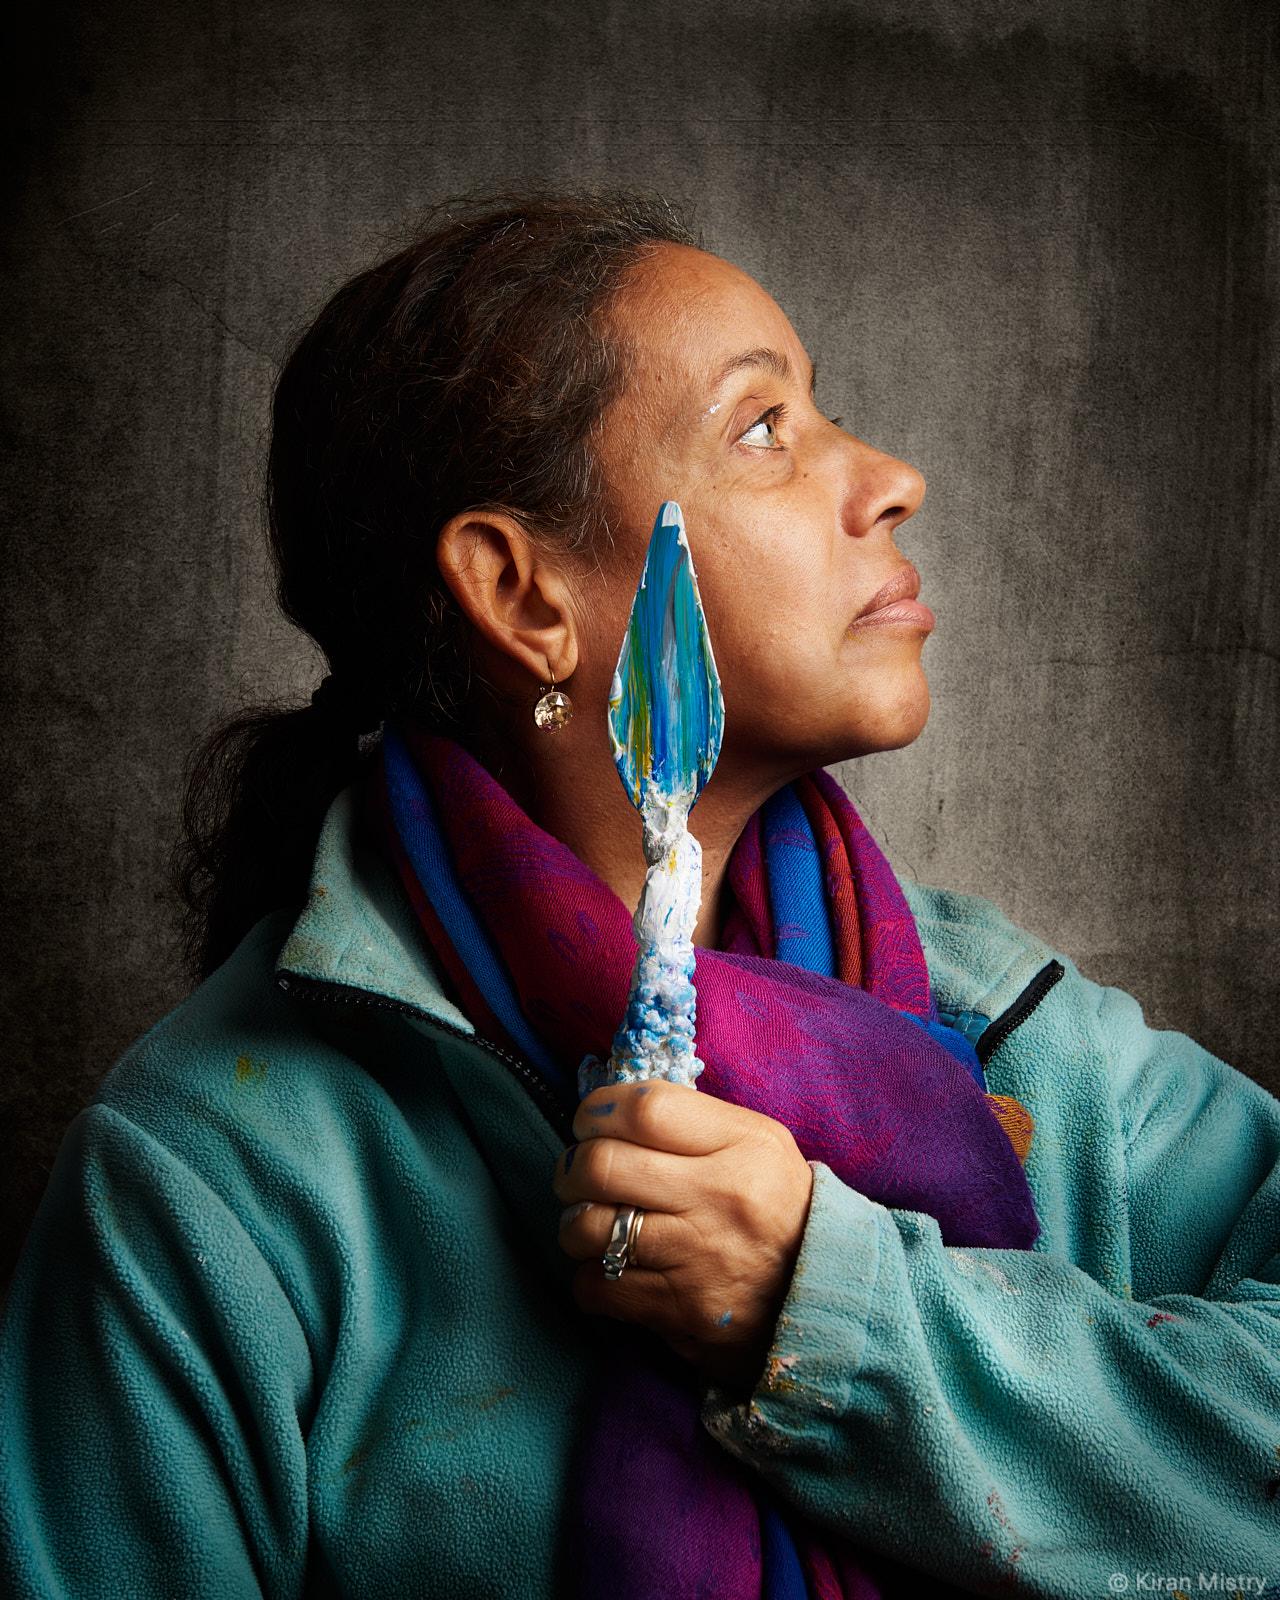 Portrait artist Susan Aggarwal